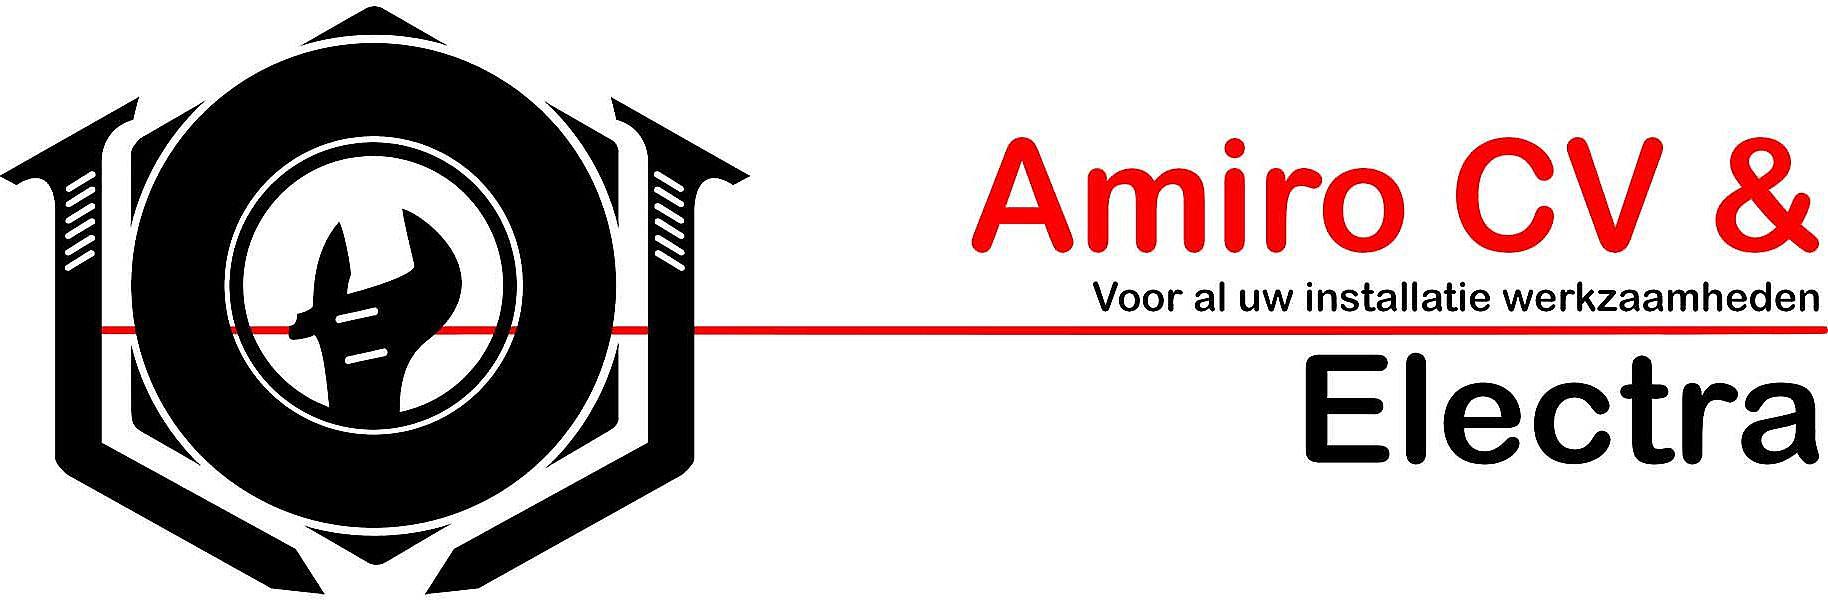 Amiro